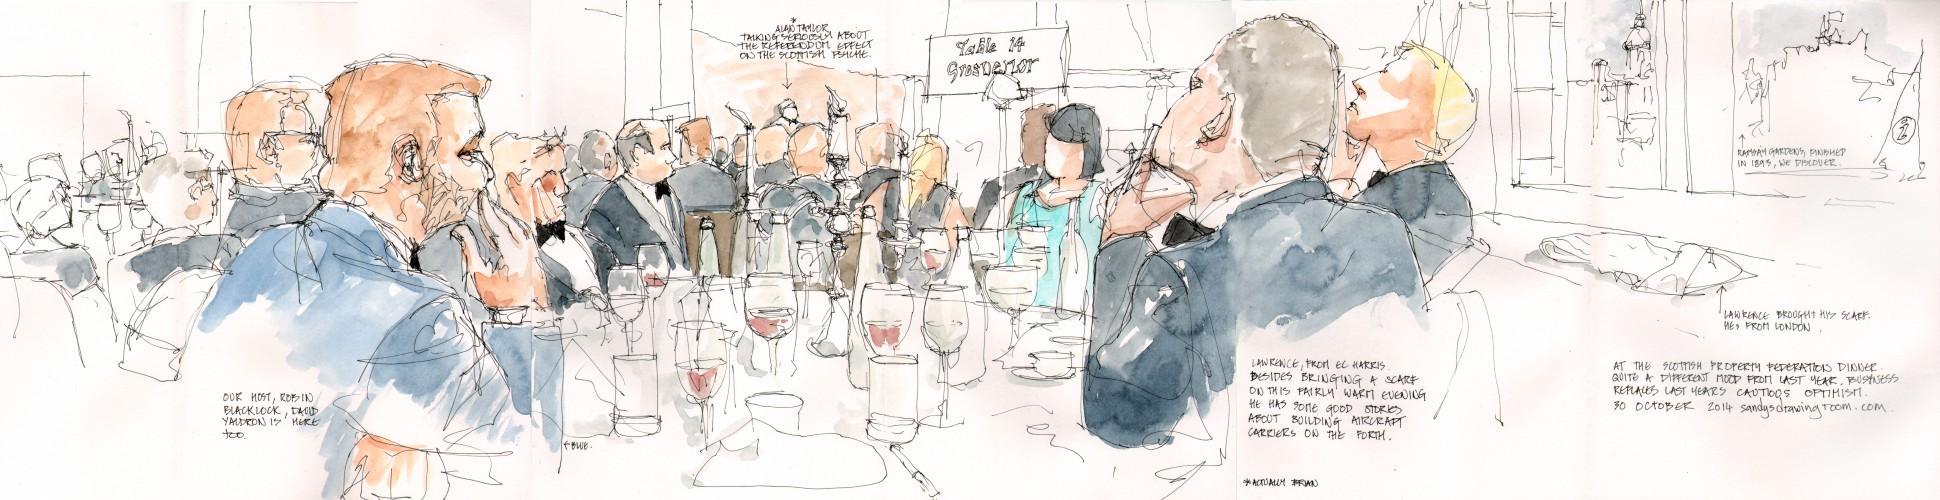 SPF Dinner with Grosvenor - 30 October 2014 a